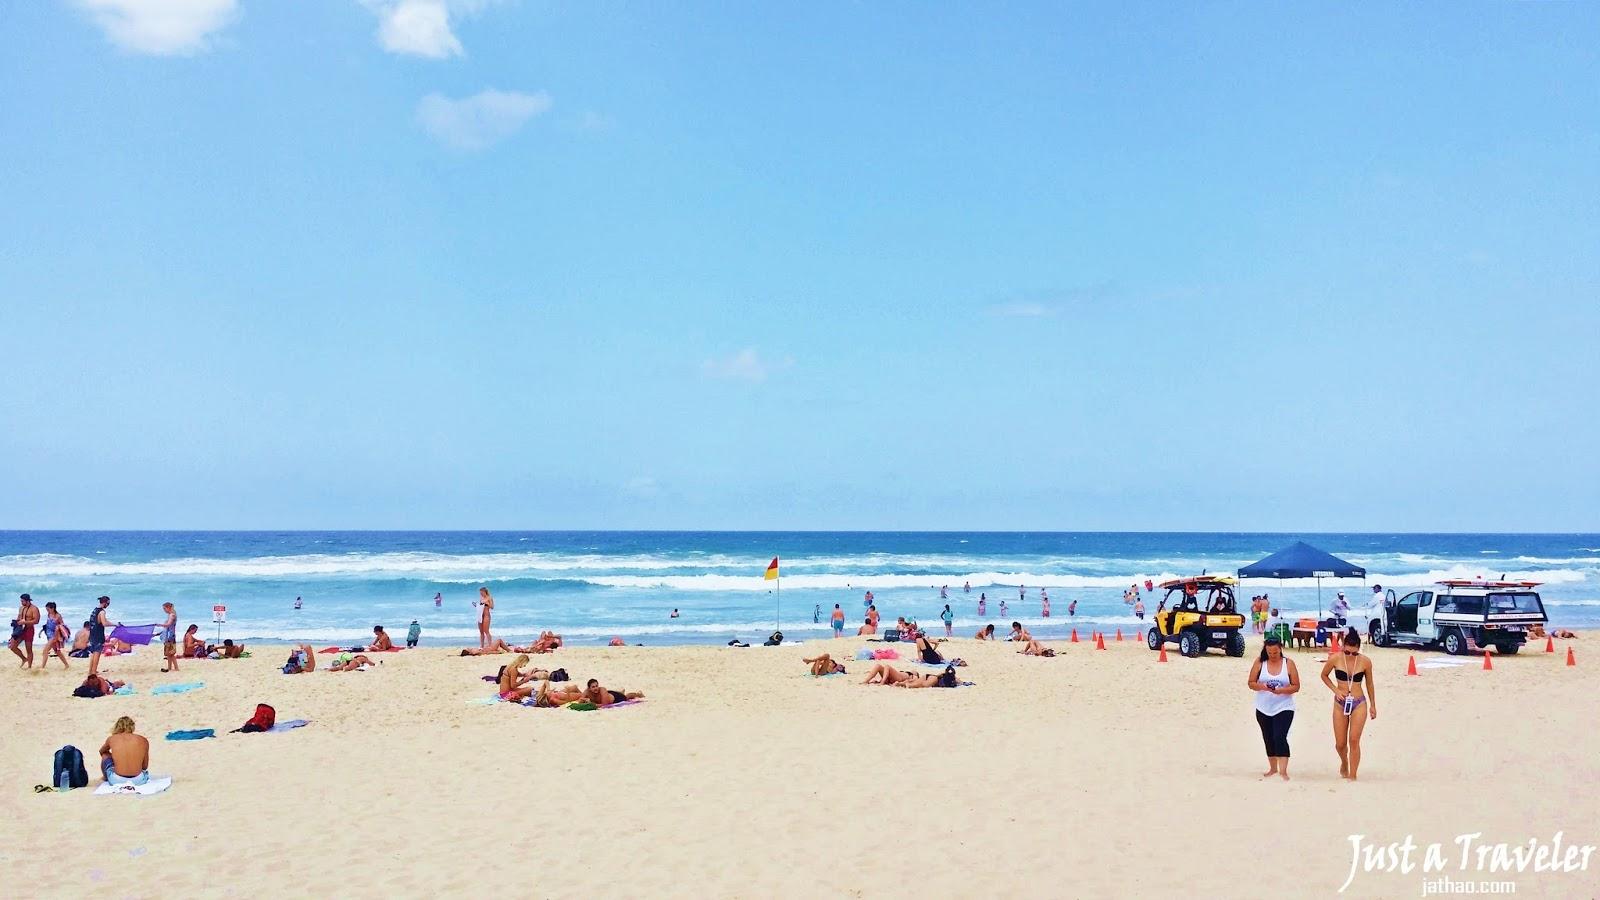 黃金海岸-景點-推薦-衝浪者天堂-Gold-Coast-Attraction-Surfers-Paradise-Tourist-destination